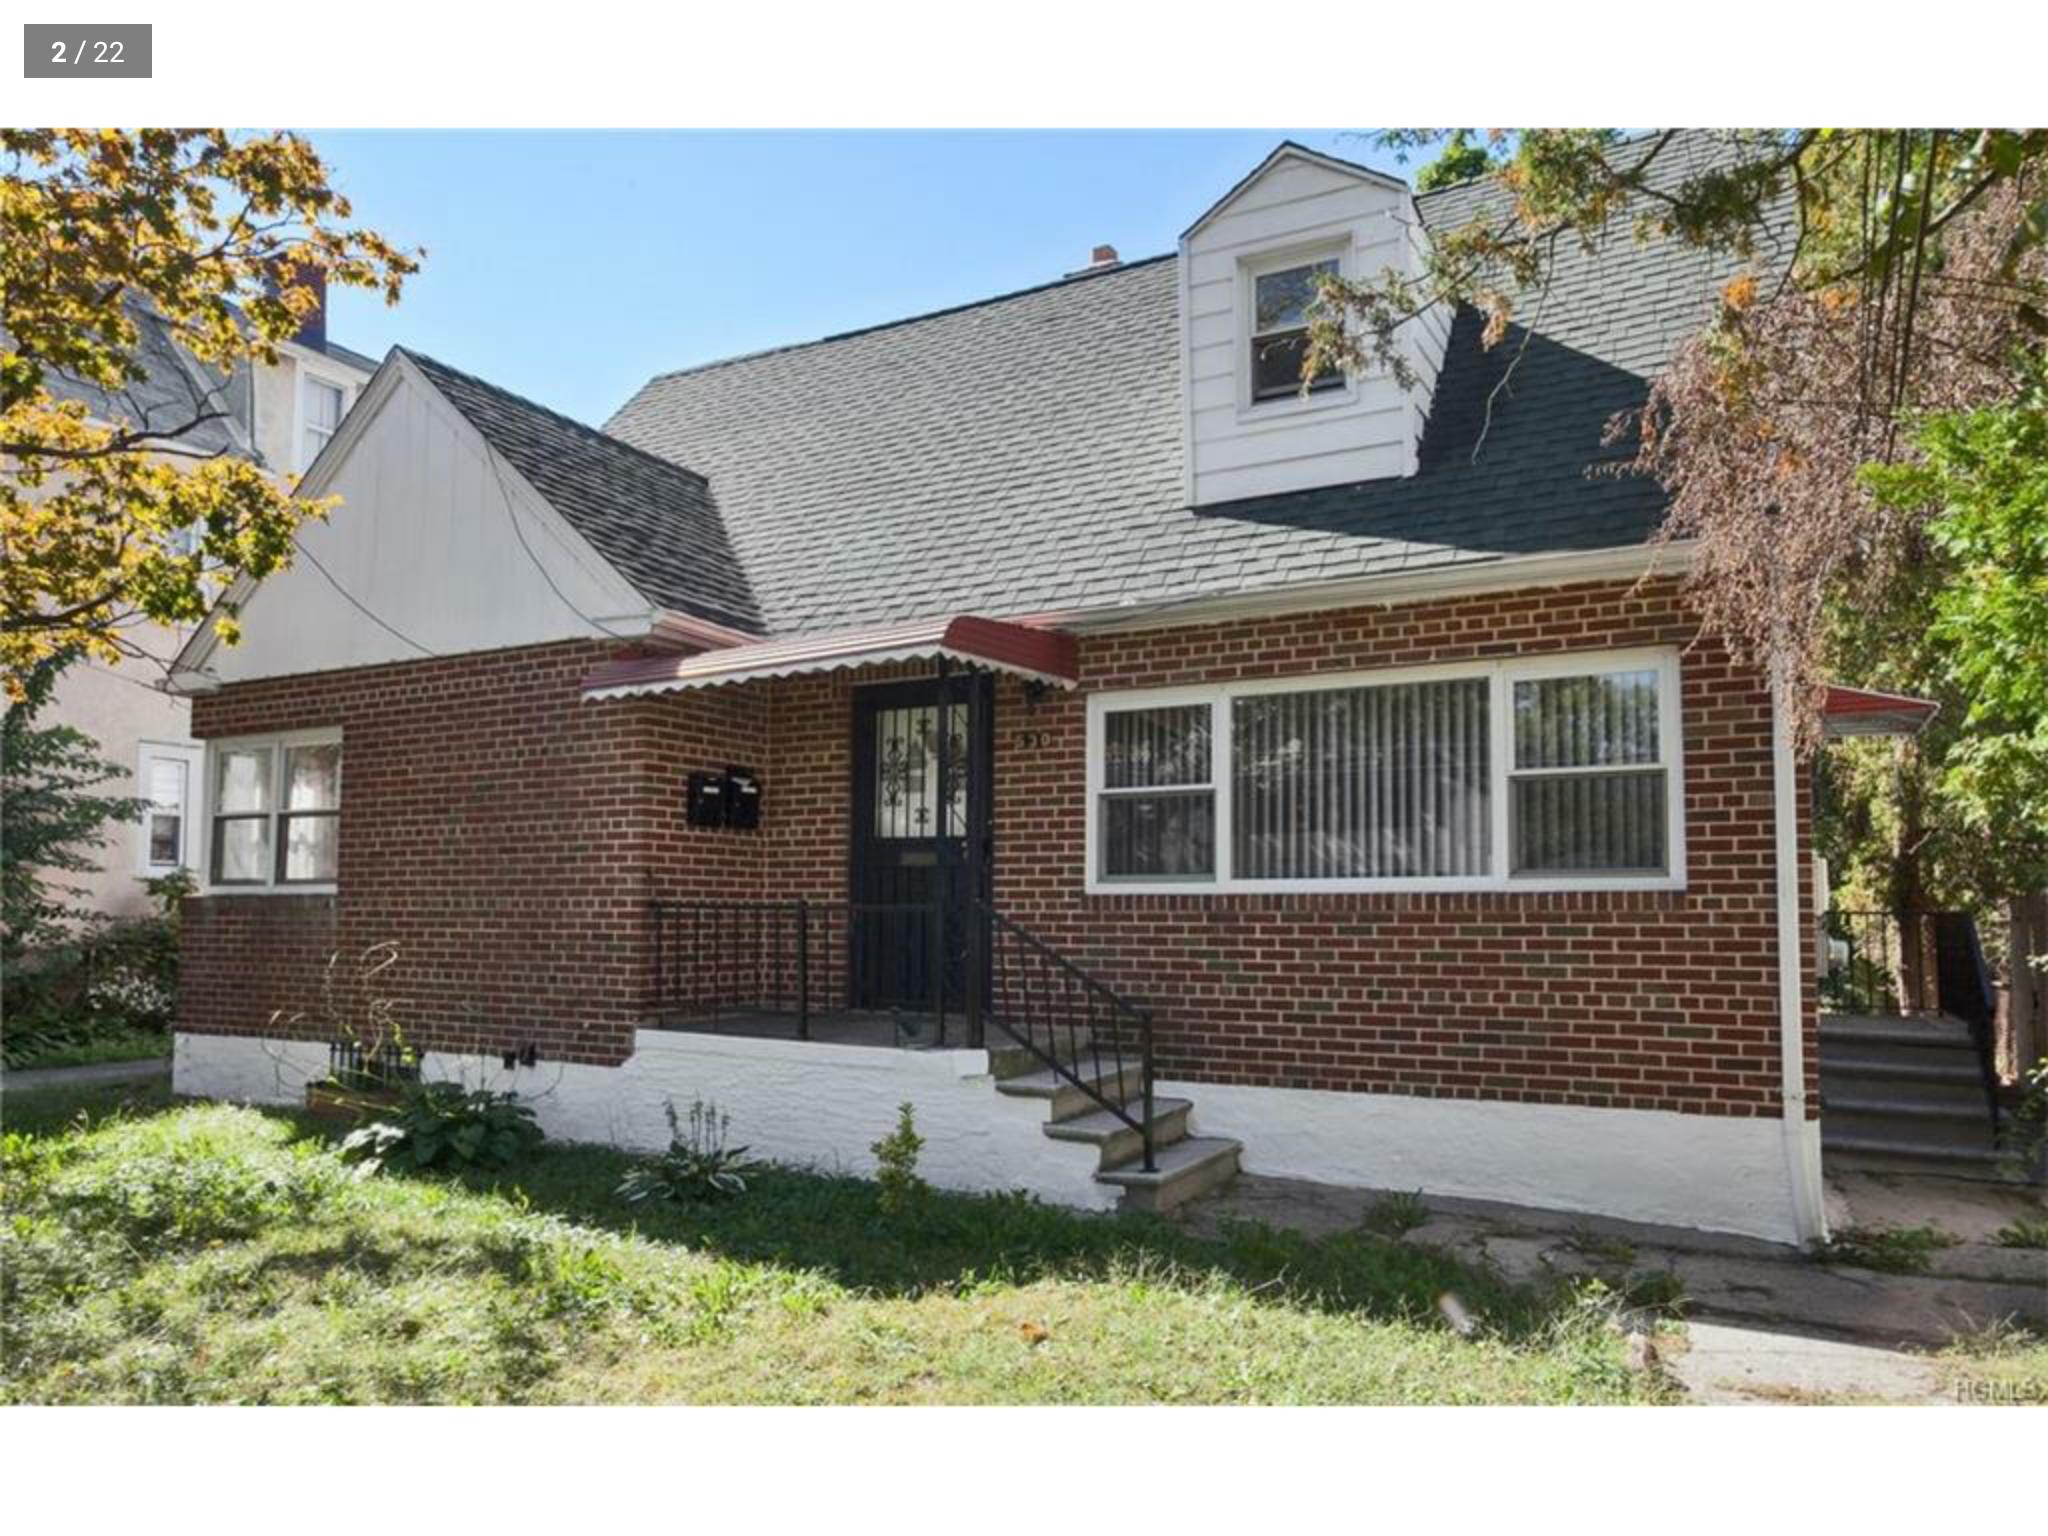 530 South 9th Avenue  Mount Vernon, NY 10550